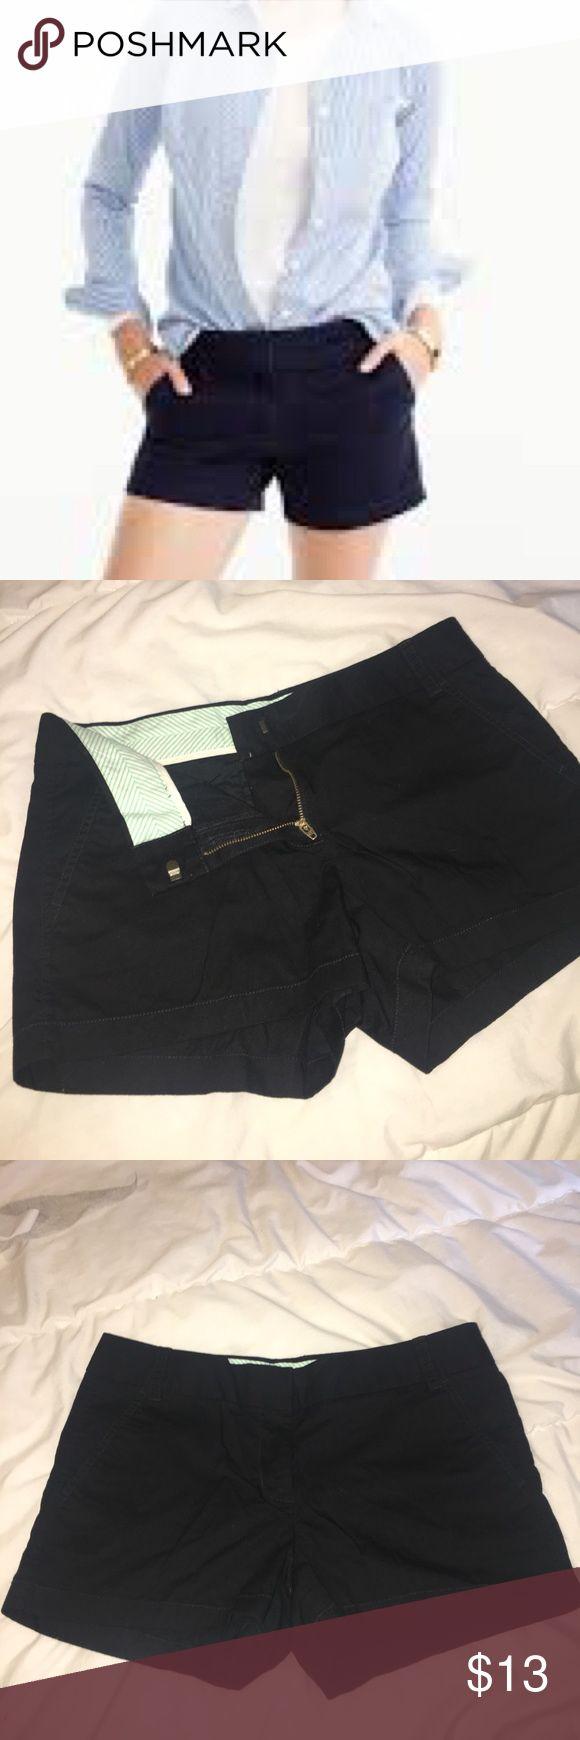 J. Crew Black Broken-in Chino Shorts J. Crew Black Broken-in Chino Shorts - like new J. Crew Shorts